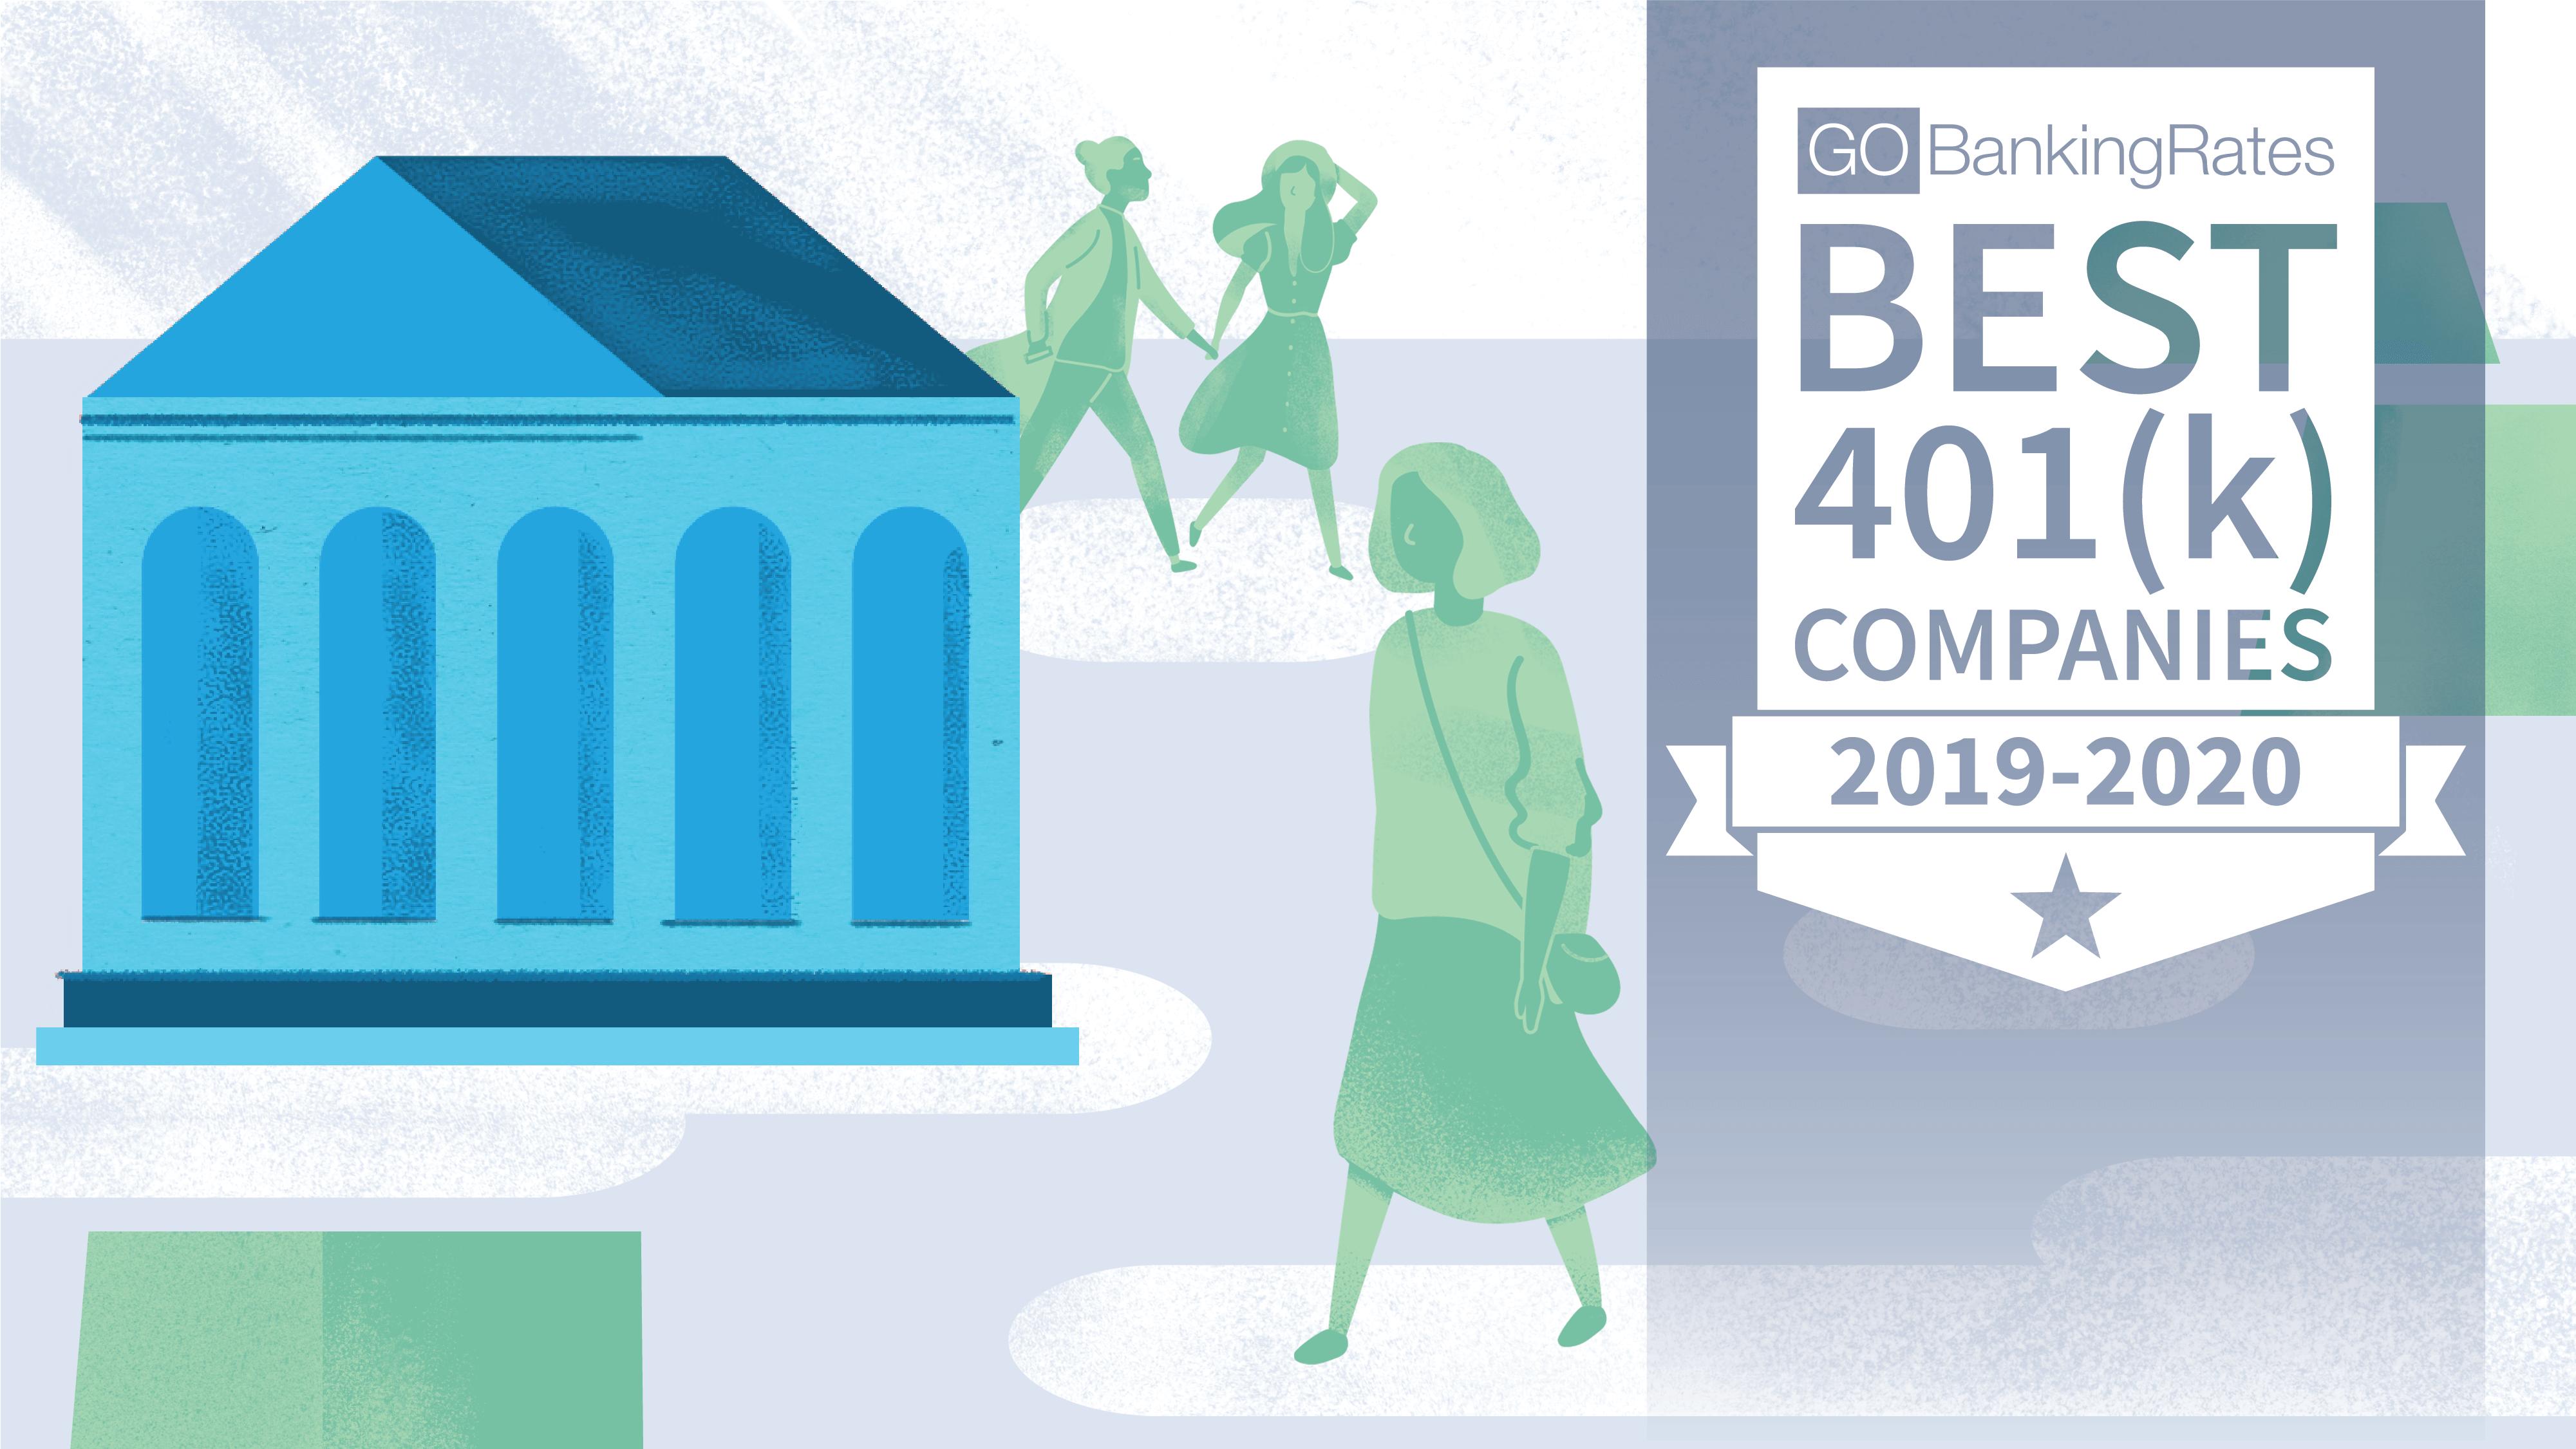 Best 401(k) Companies of 2019-2020